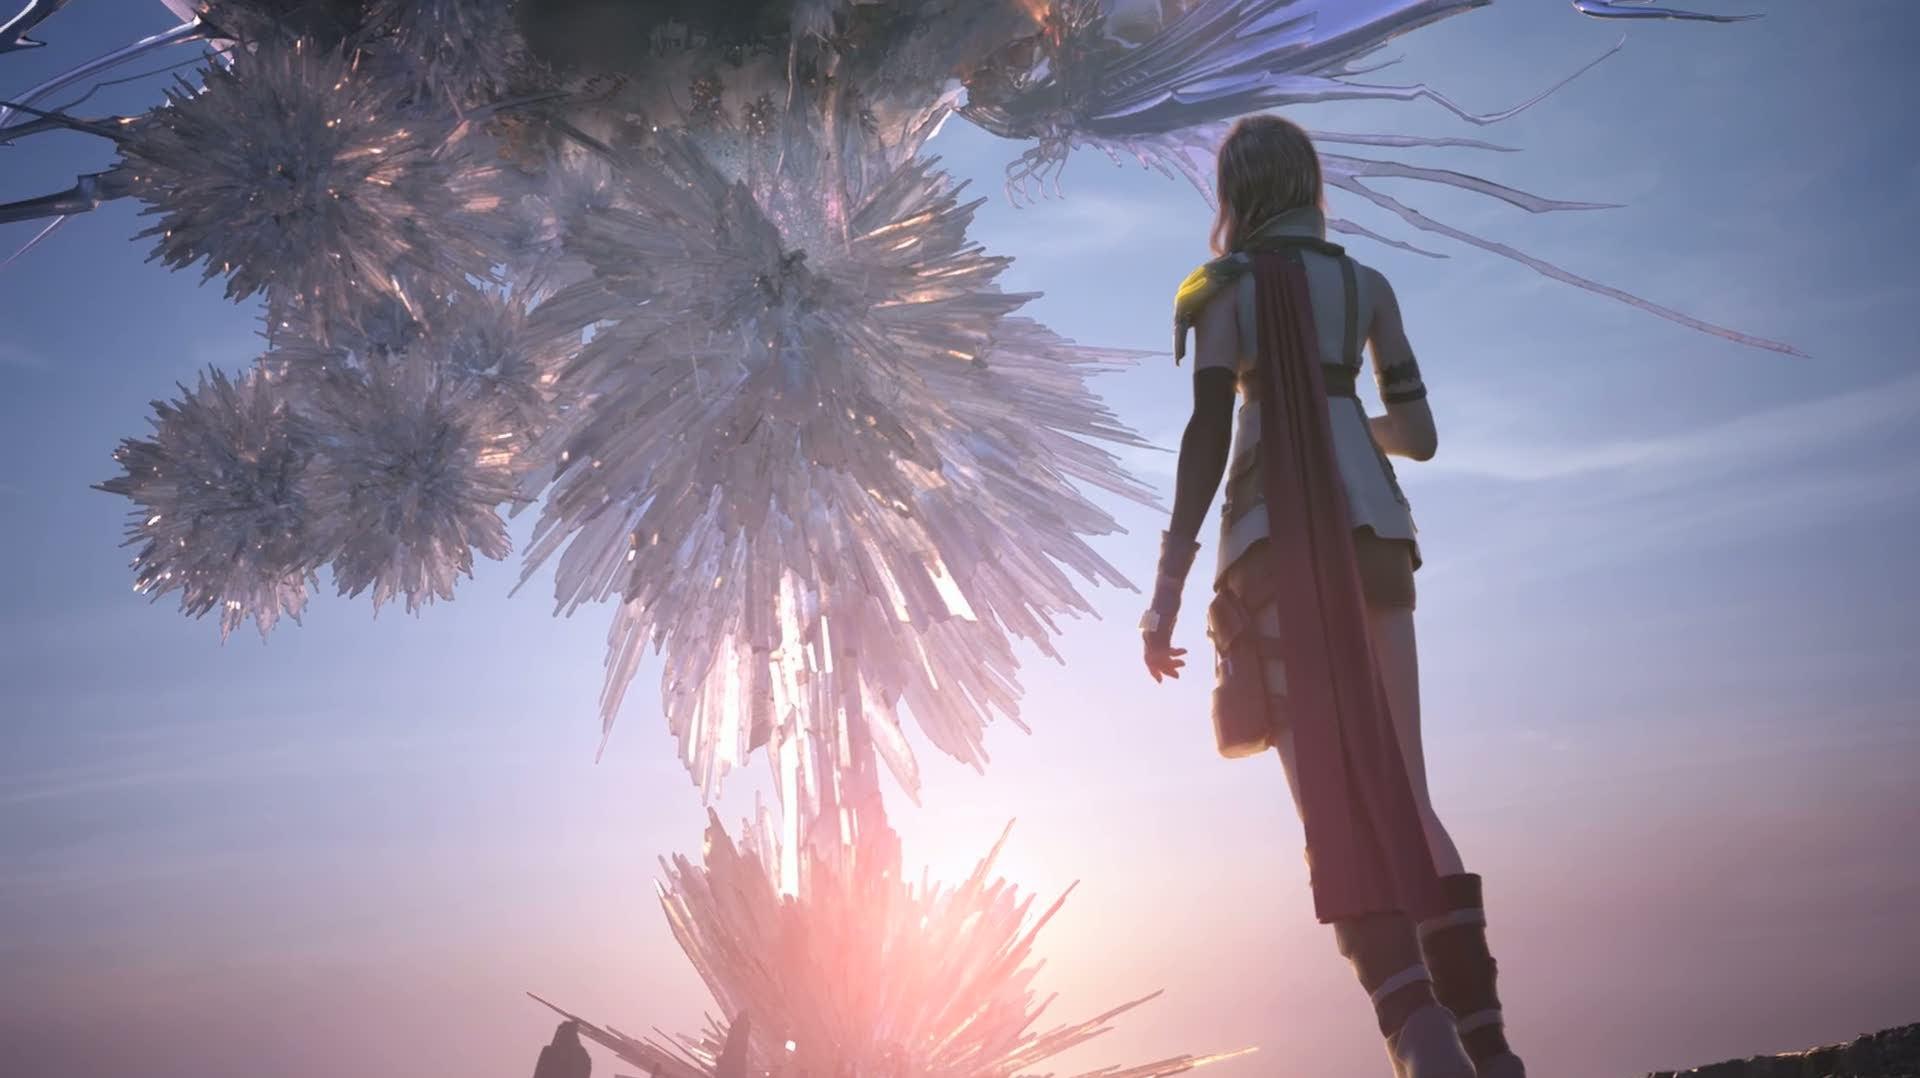 Triple Threat Final Fantasy Xiii Vs Final Fantasy Xiii 2 Vs